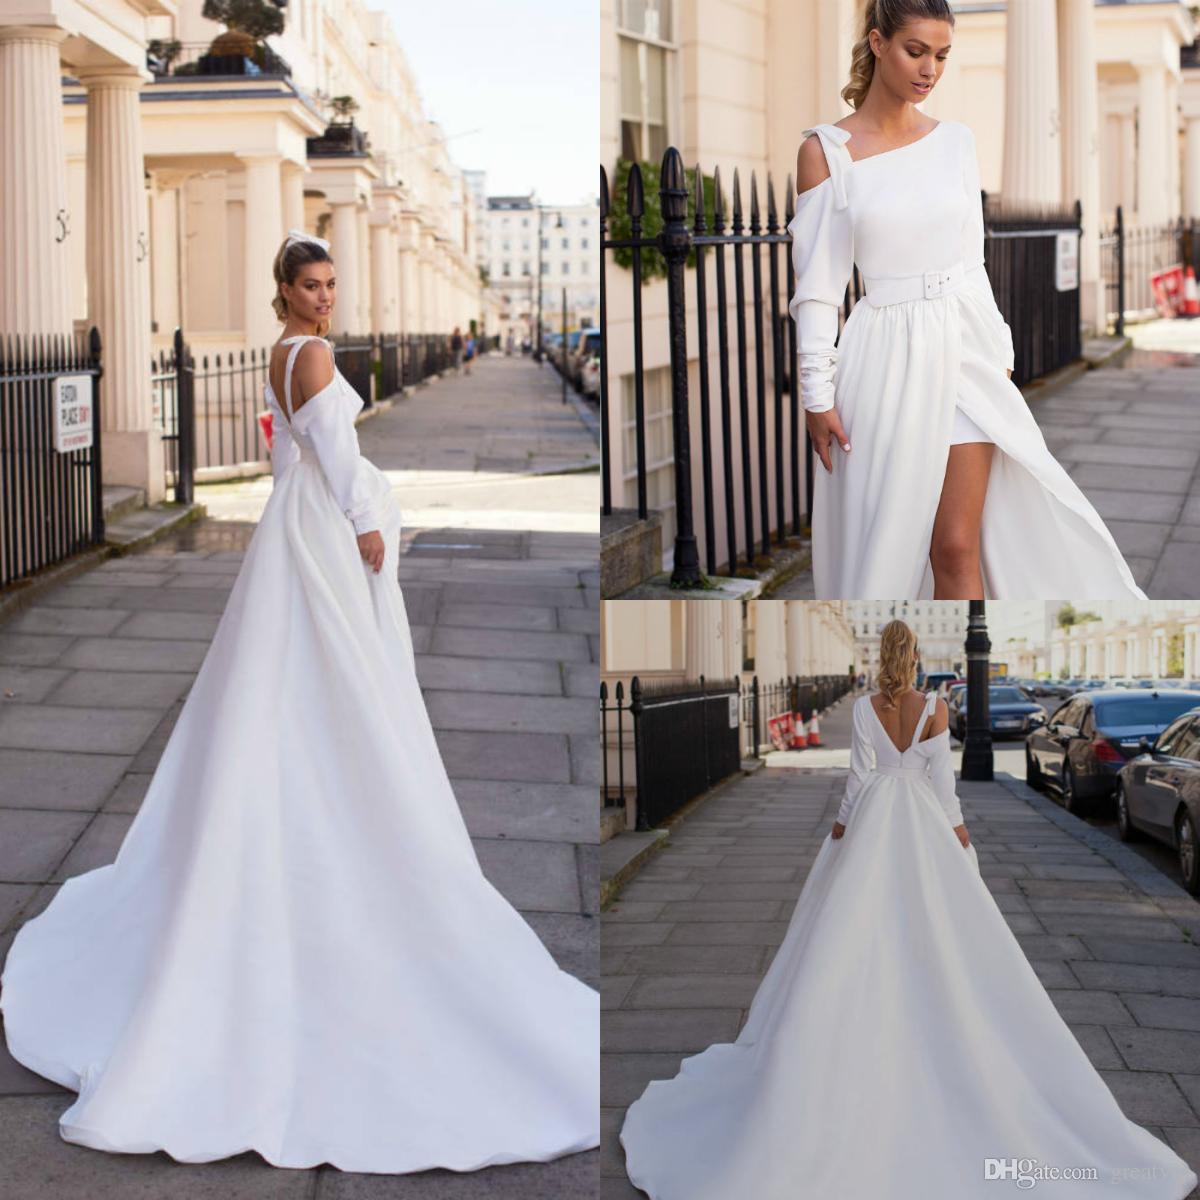 bc2b99a598ca Discount 2019 Autumn Milla Nova Wedding Dresses A Line Long Sleeve Satin  Split Backless Sash Sweep Train Plus Size Bridal Gowns Robe De Mariée  Halter ...